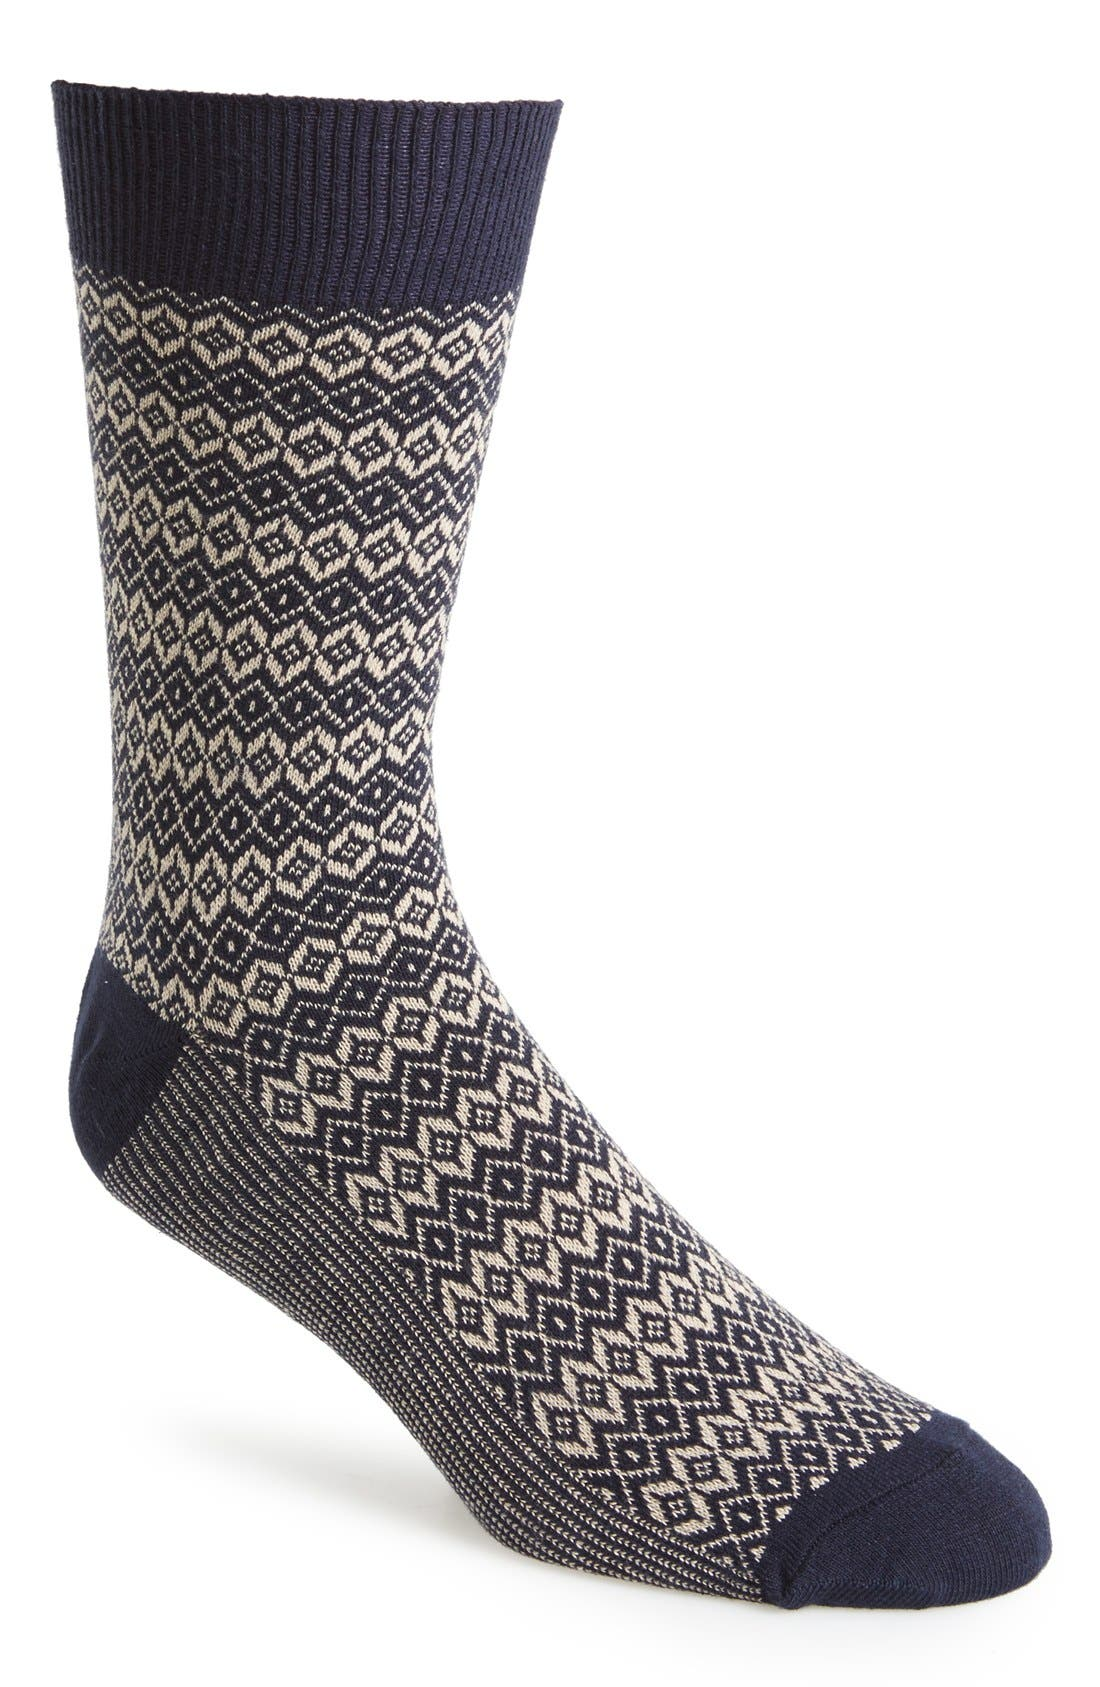 'Fair Isle' Socks,                             Main thumbnail 1, color,                             410